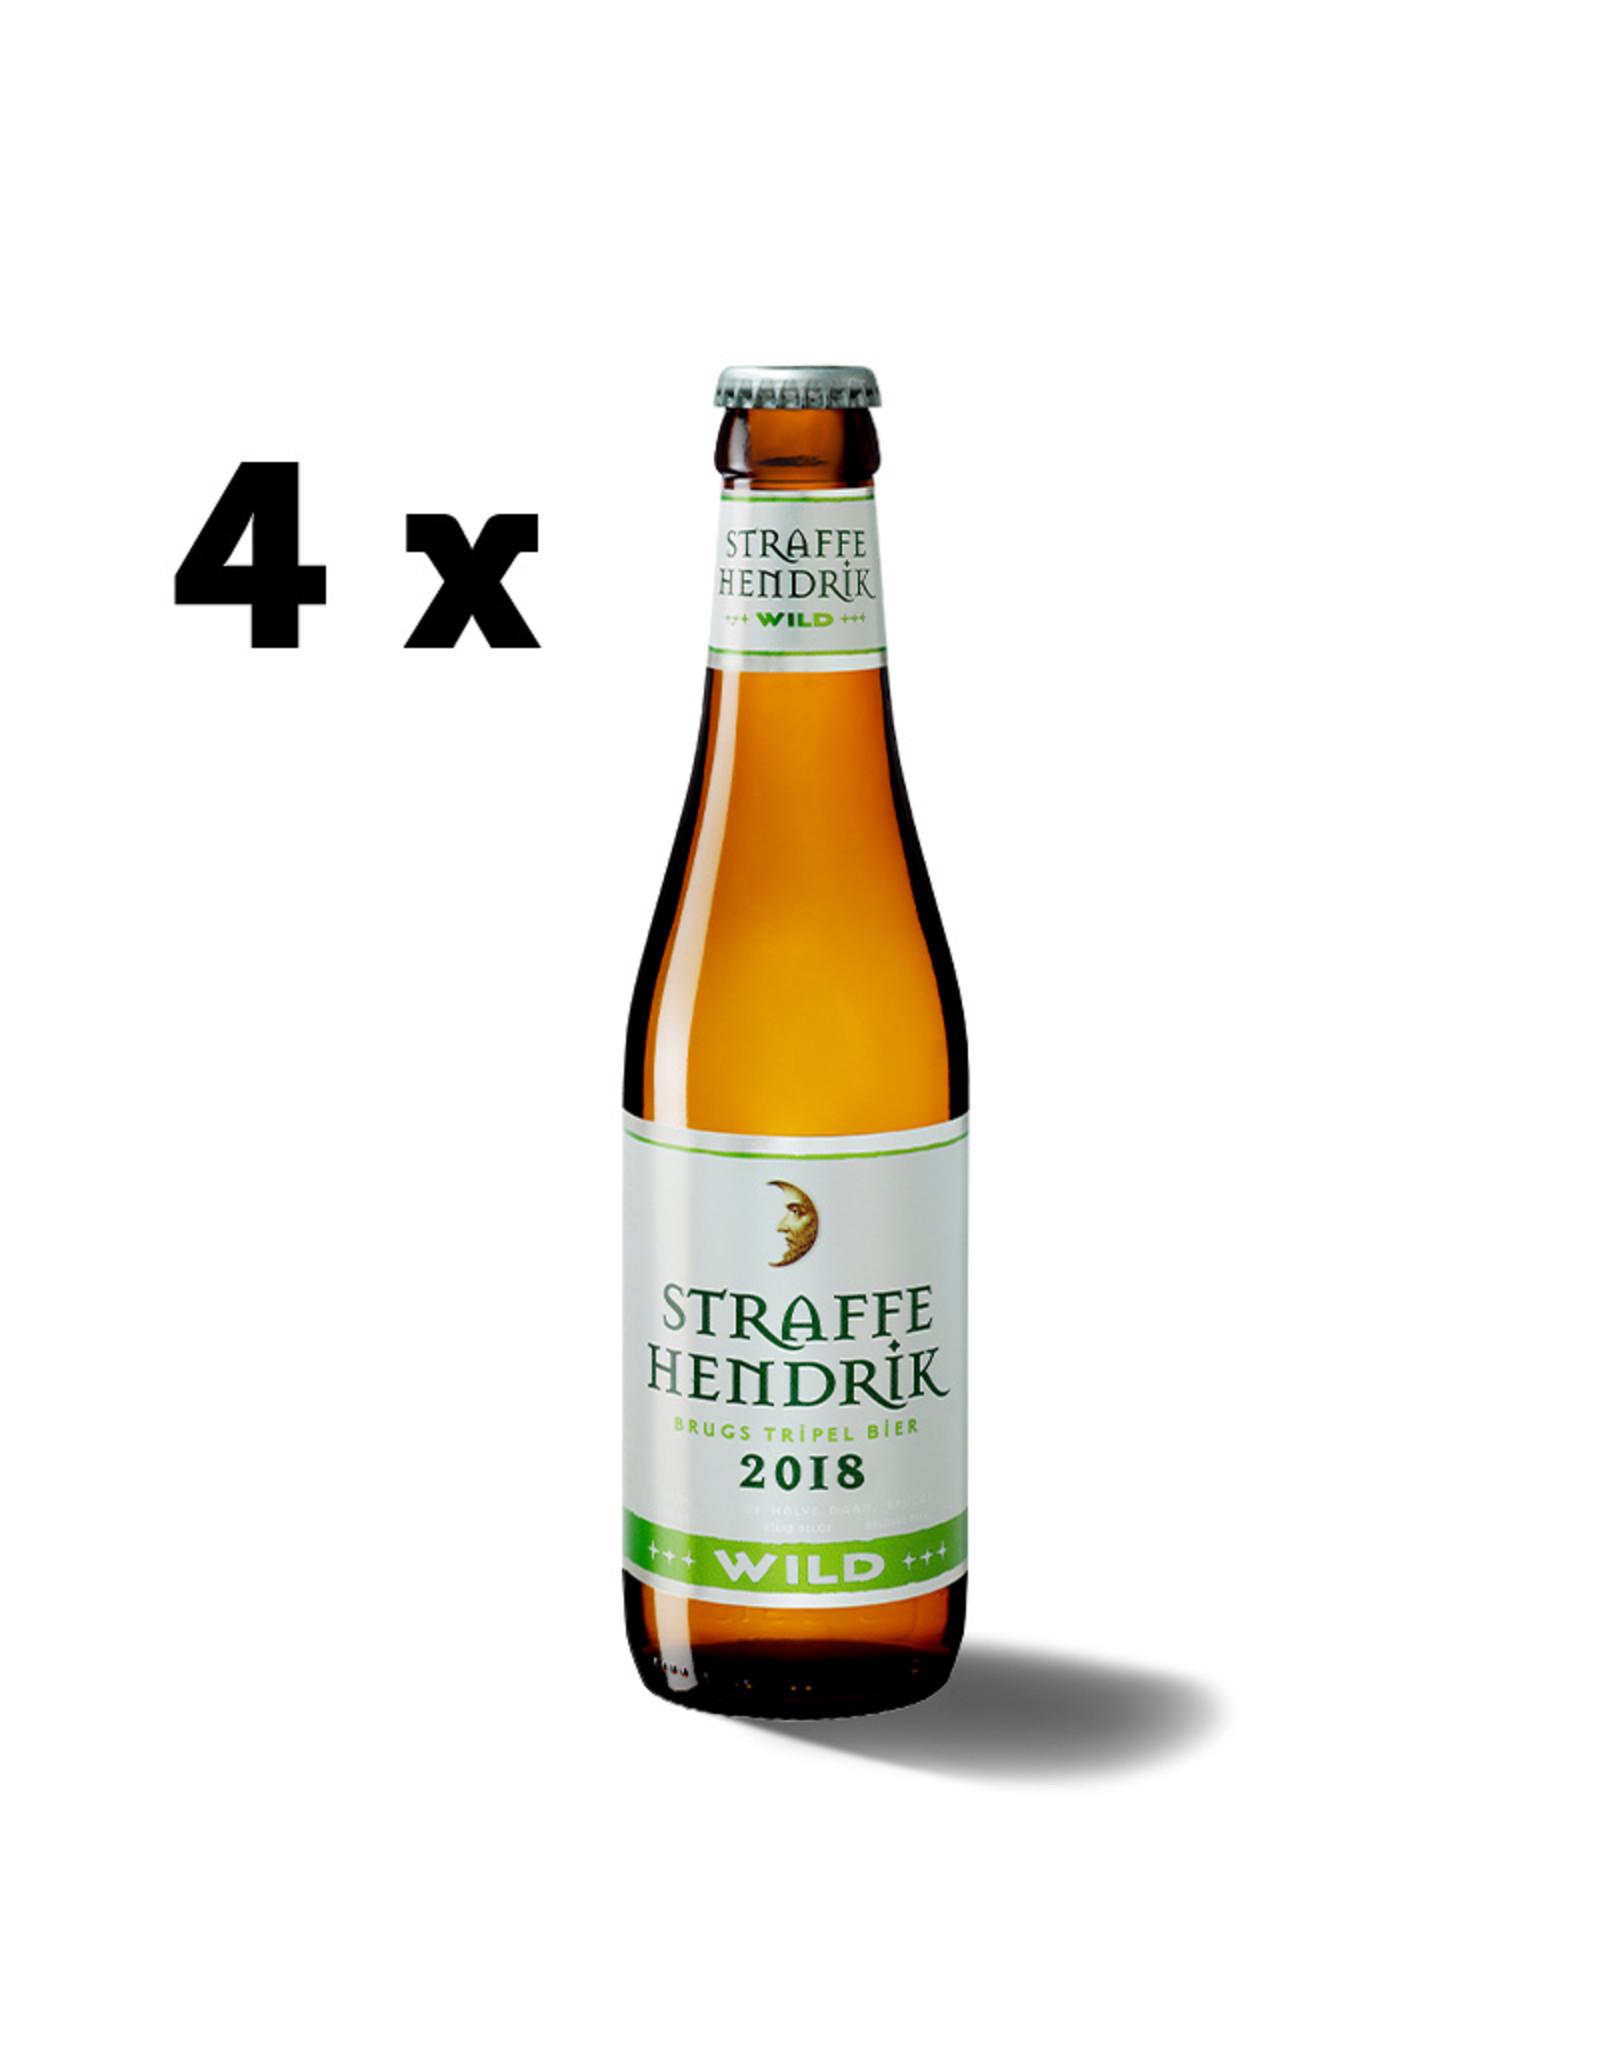 Straffe Hendrik Straffe Hendrik Wild 2018 4-pack 4 x 33 cl